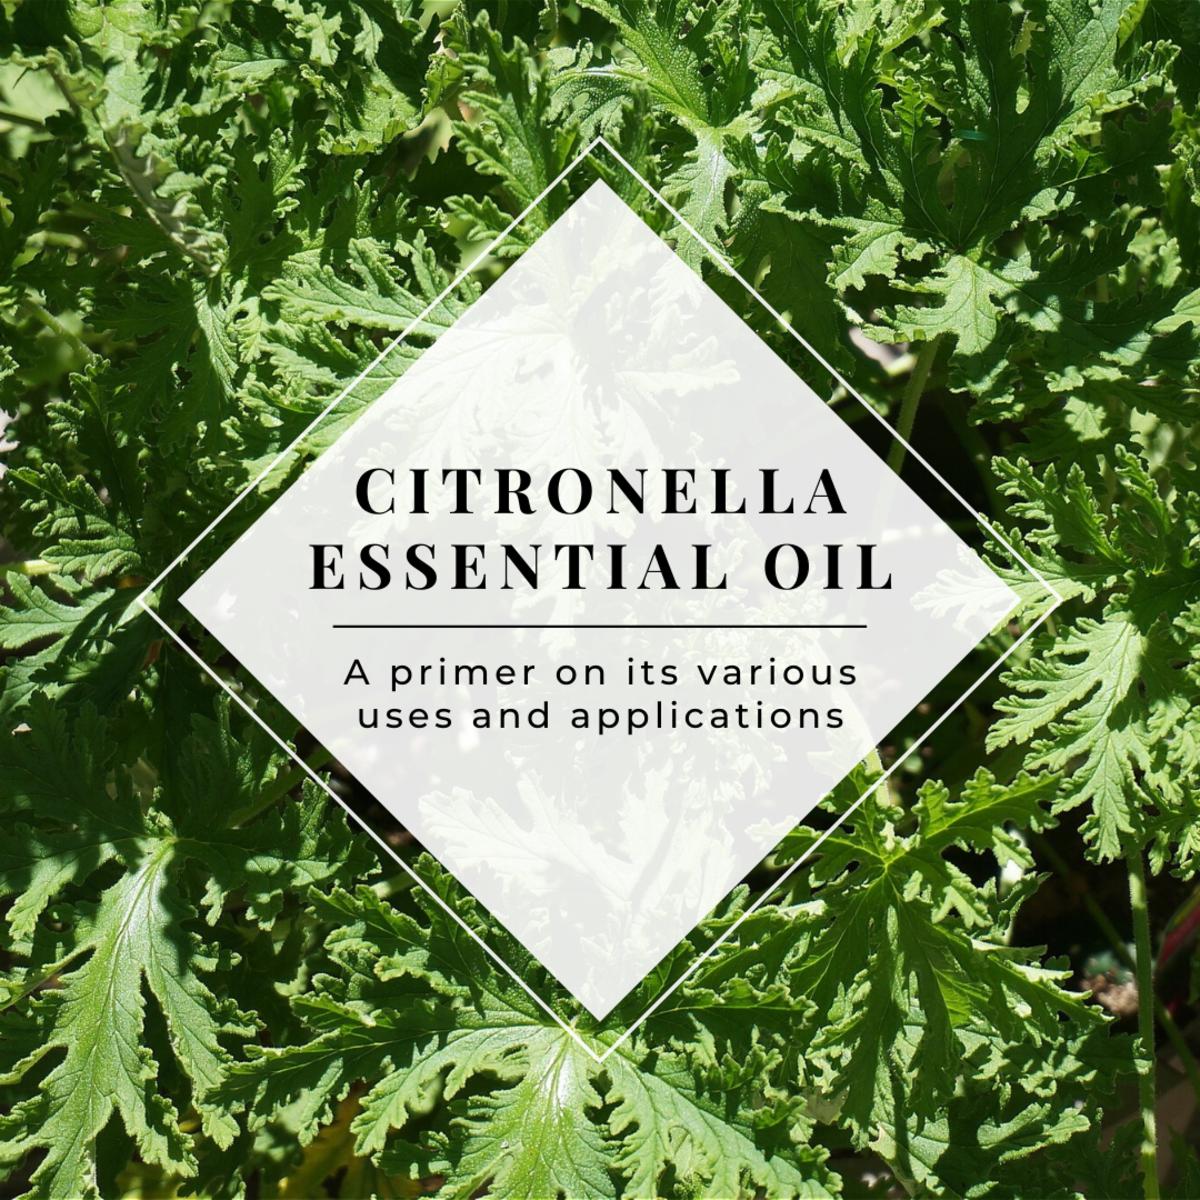 How to Use Citronella Essential Oil